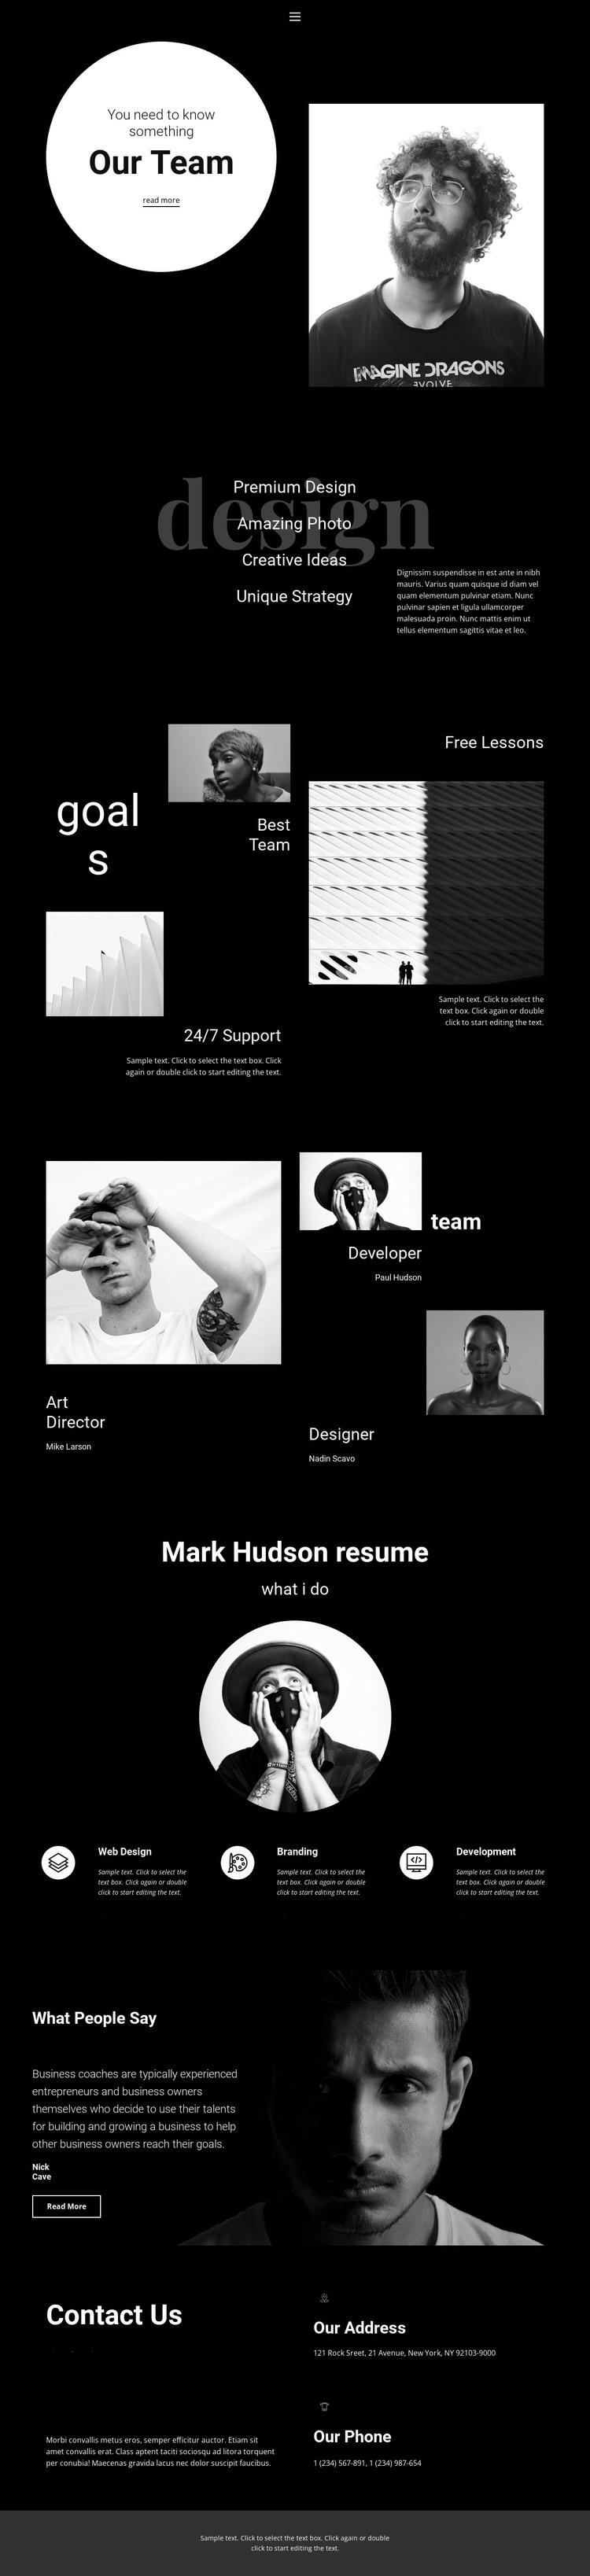 Design and development team HTML Template